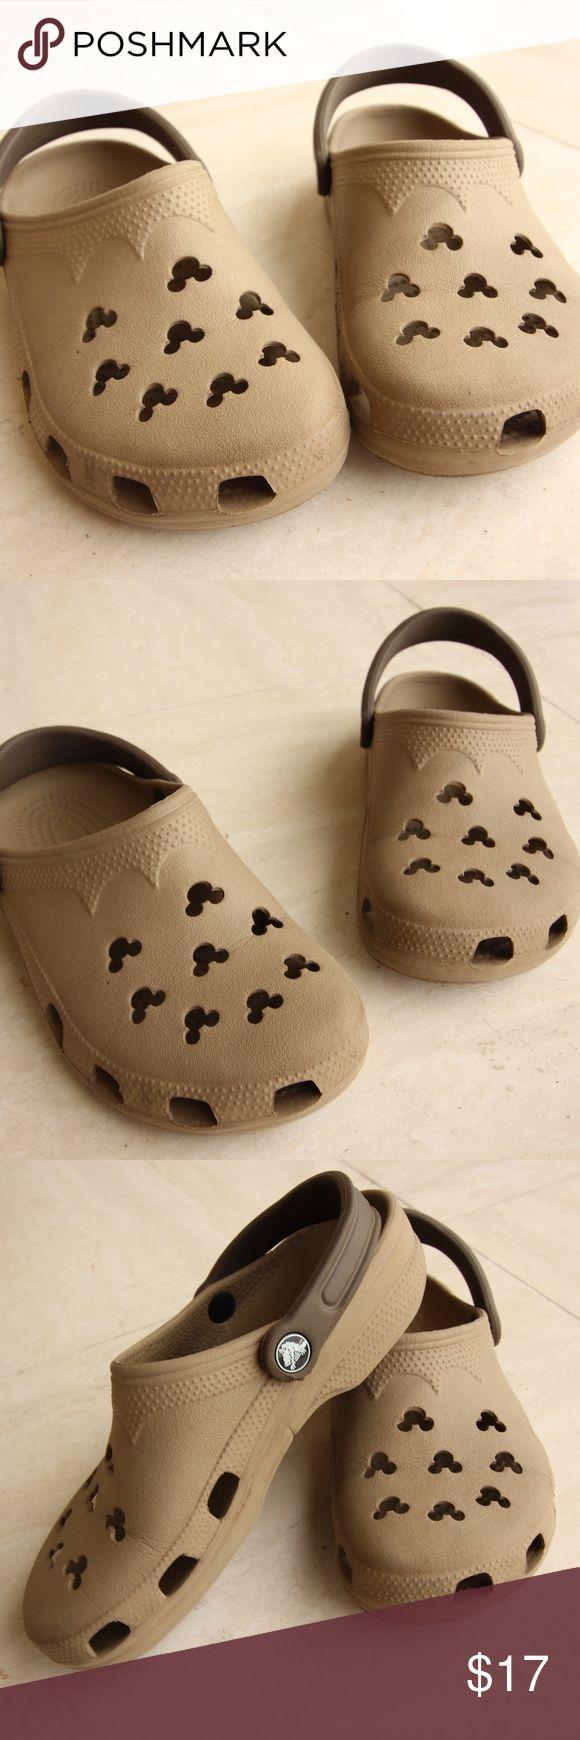 Disney Crocs (Unisex) Crocs - Disney Tan Size : Women - 6-7 , Men - 4-5   -Very gently worn crocs Shoes Sandals